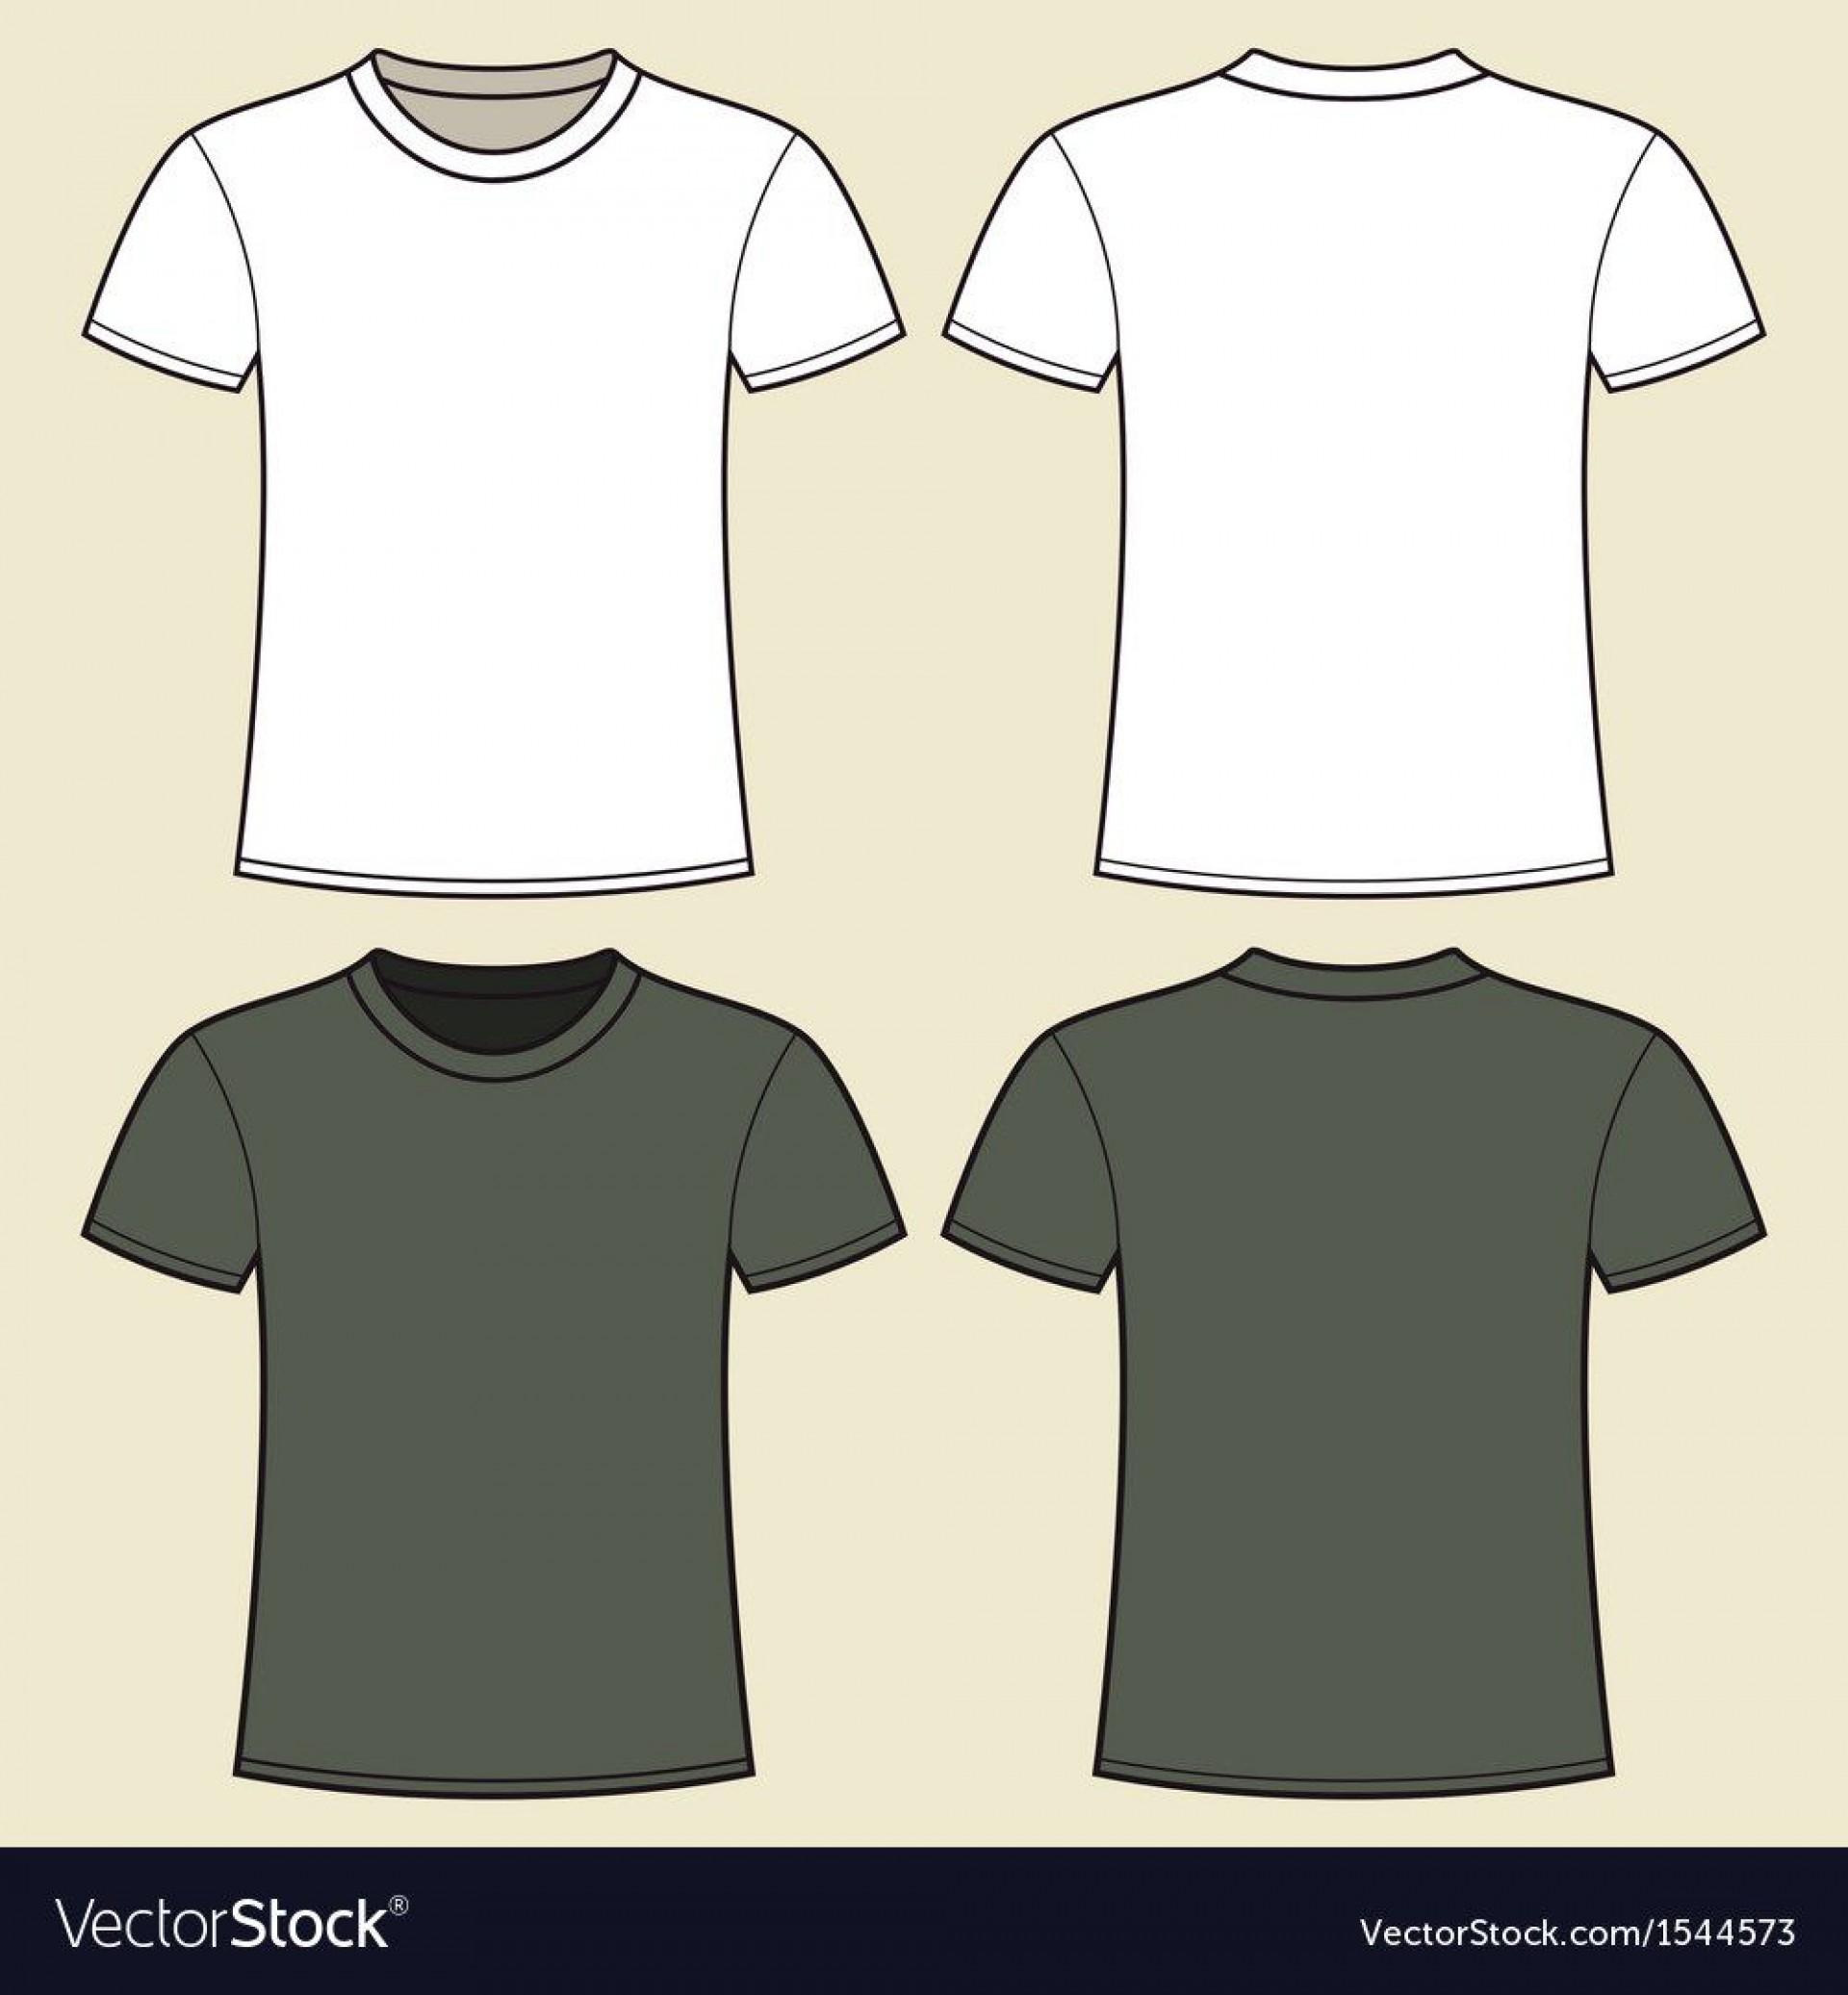 006 Singular T Shirt Design Template Ai High Def  Tee1920